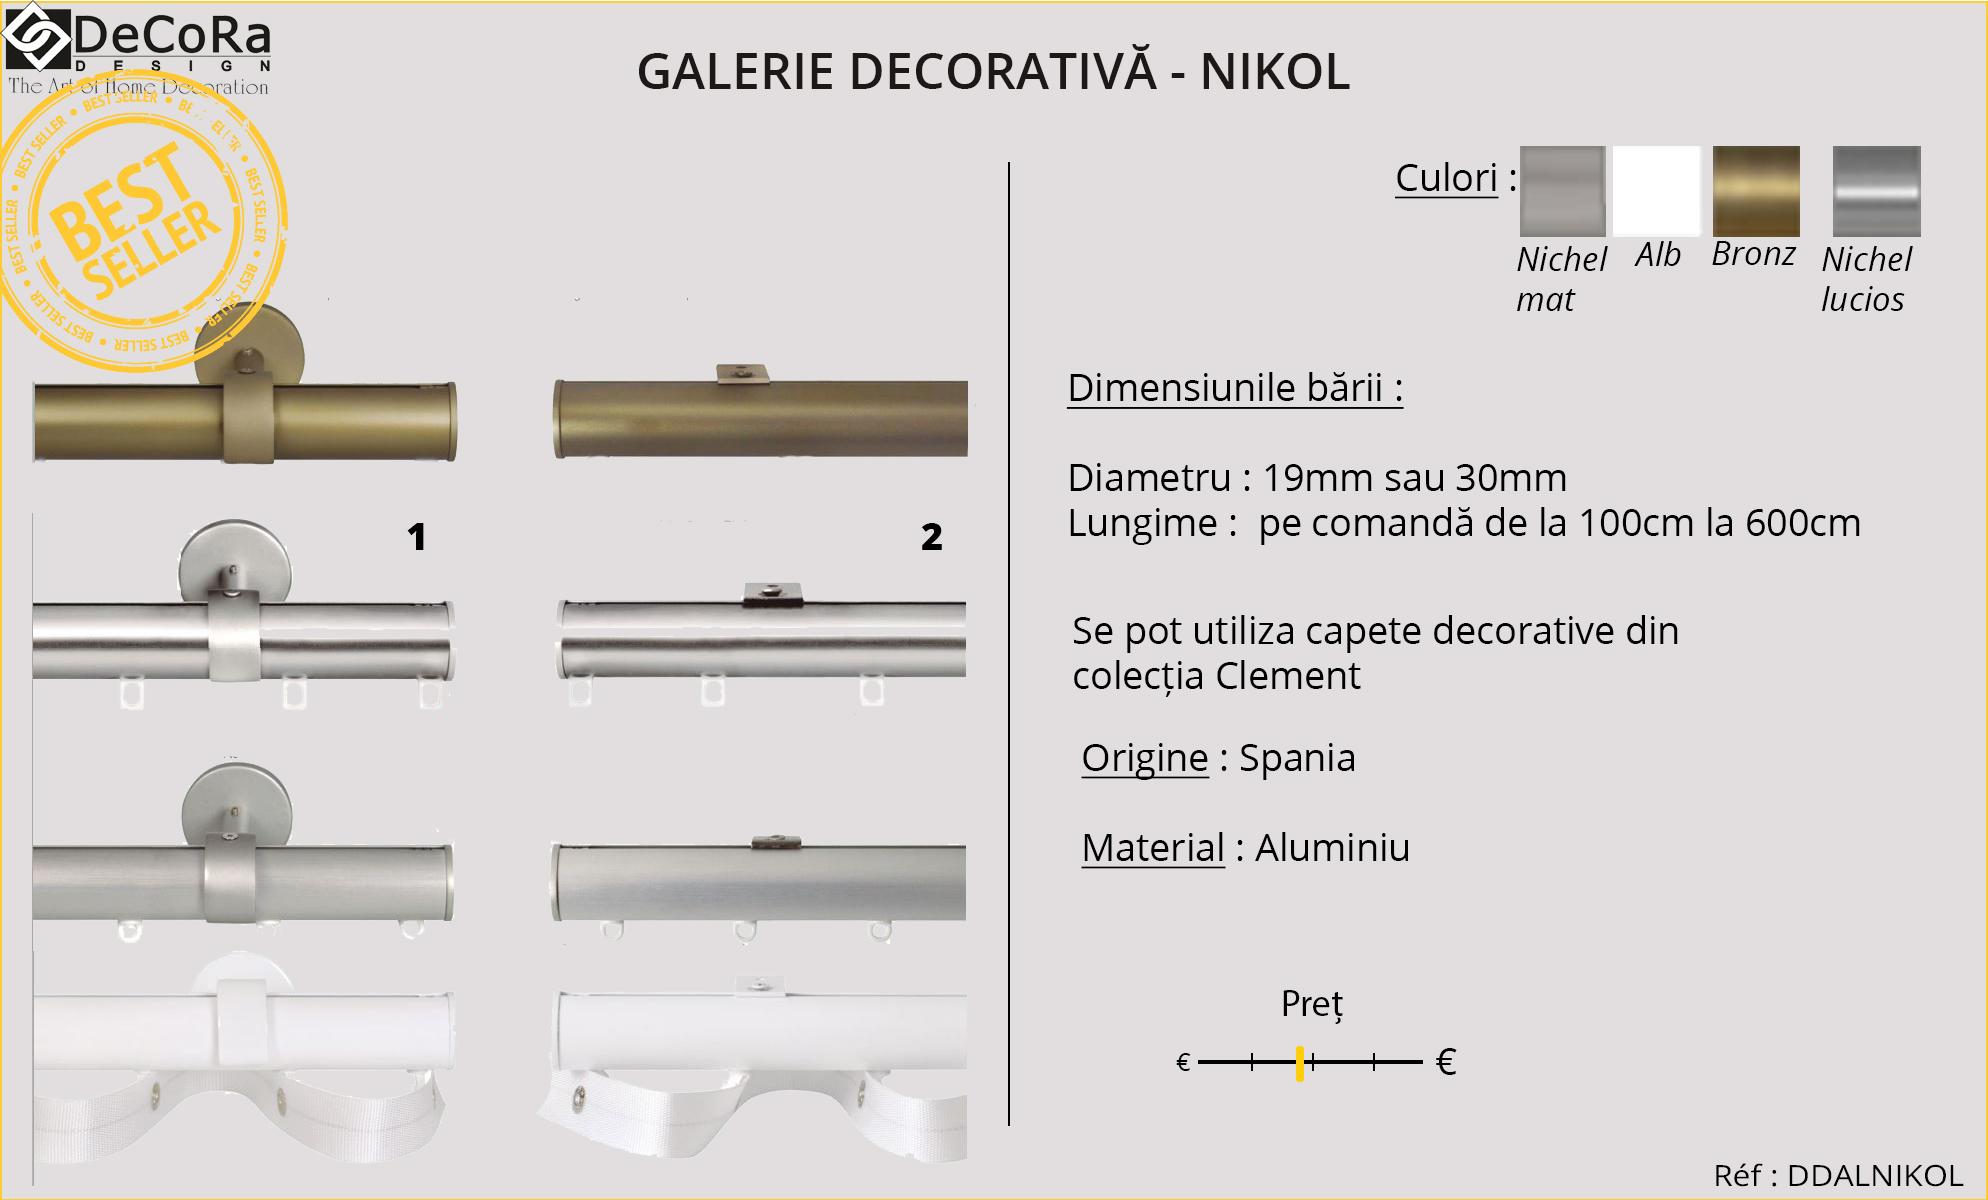 Galerie decorativa - NIKOL, fabricata in Spania, din aluminiu, cu diferite modele de capete decorative